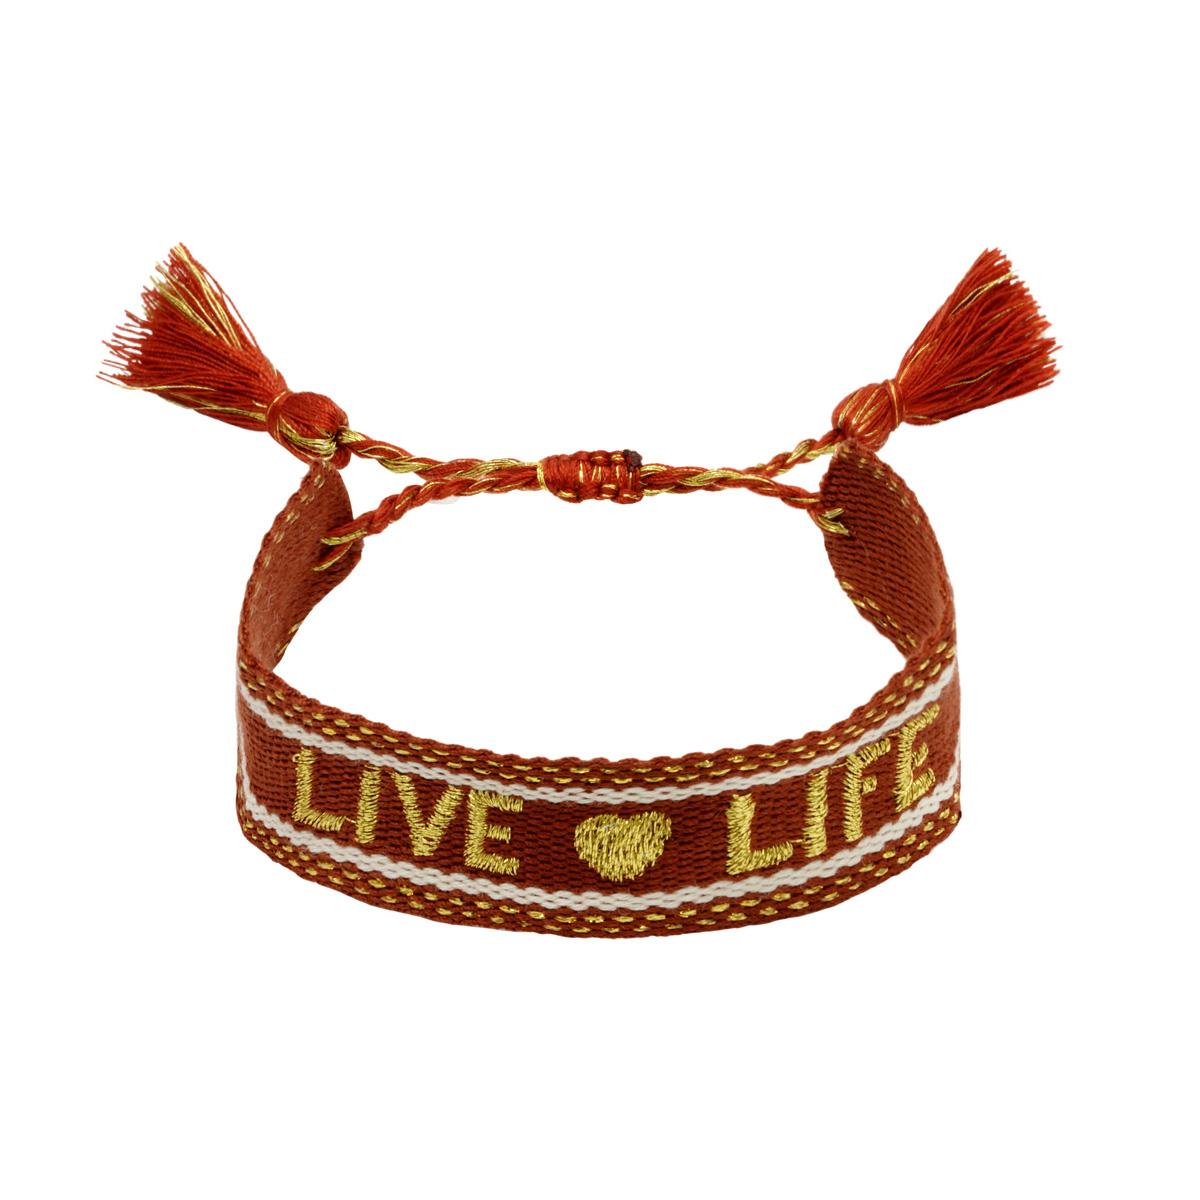 Bracelet Woven Live Life